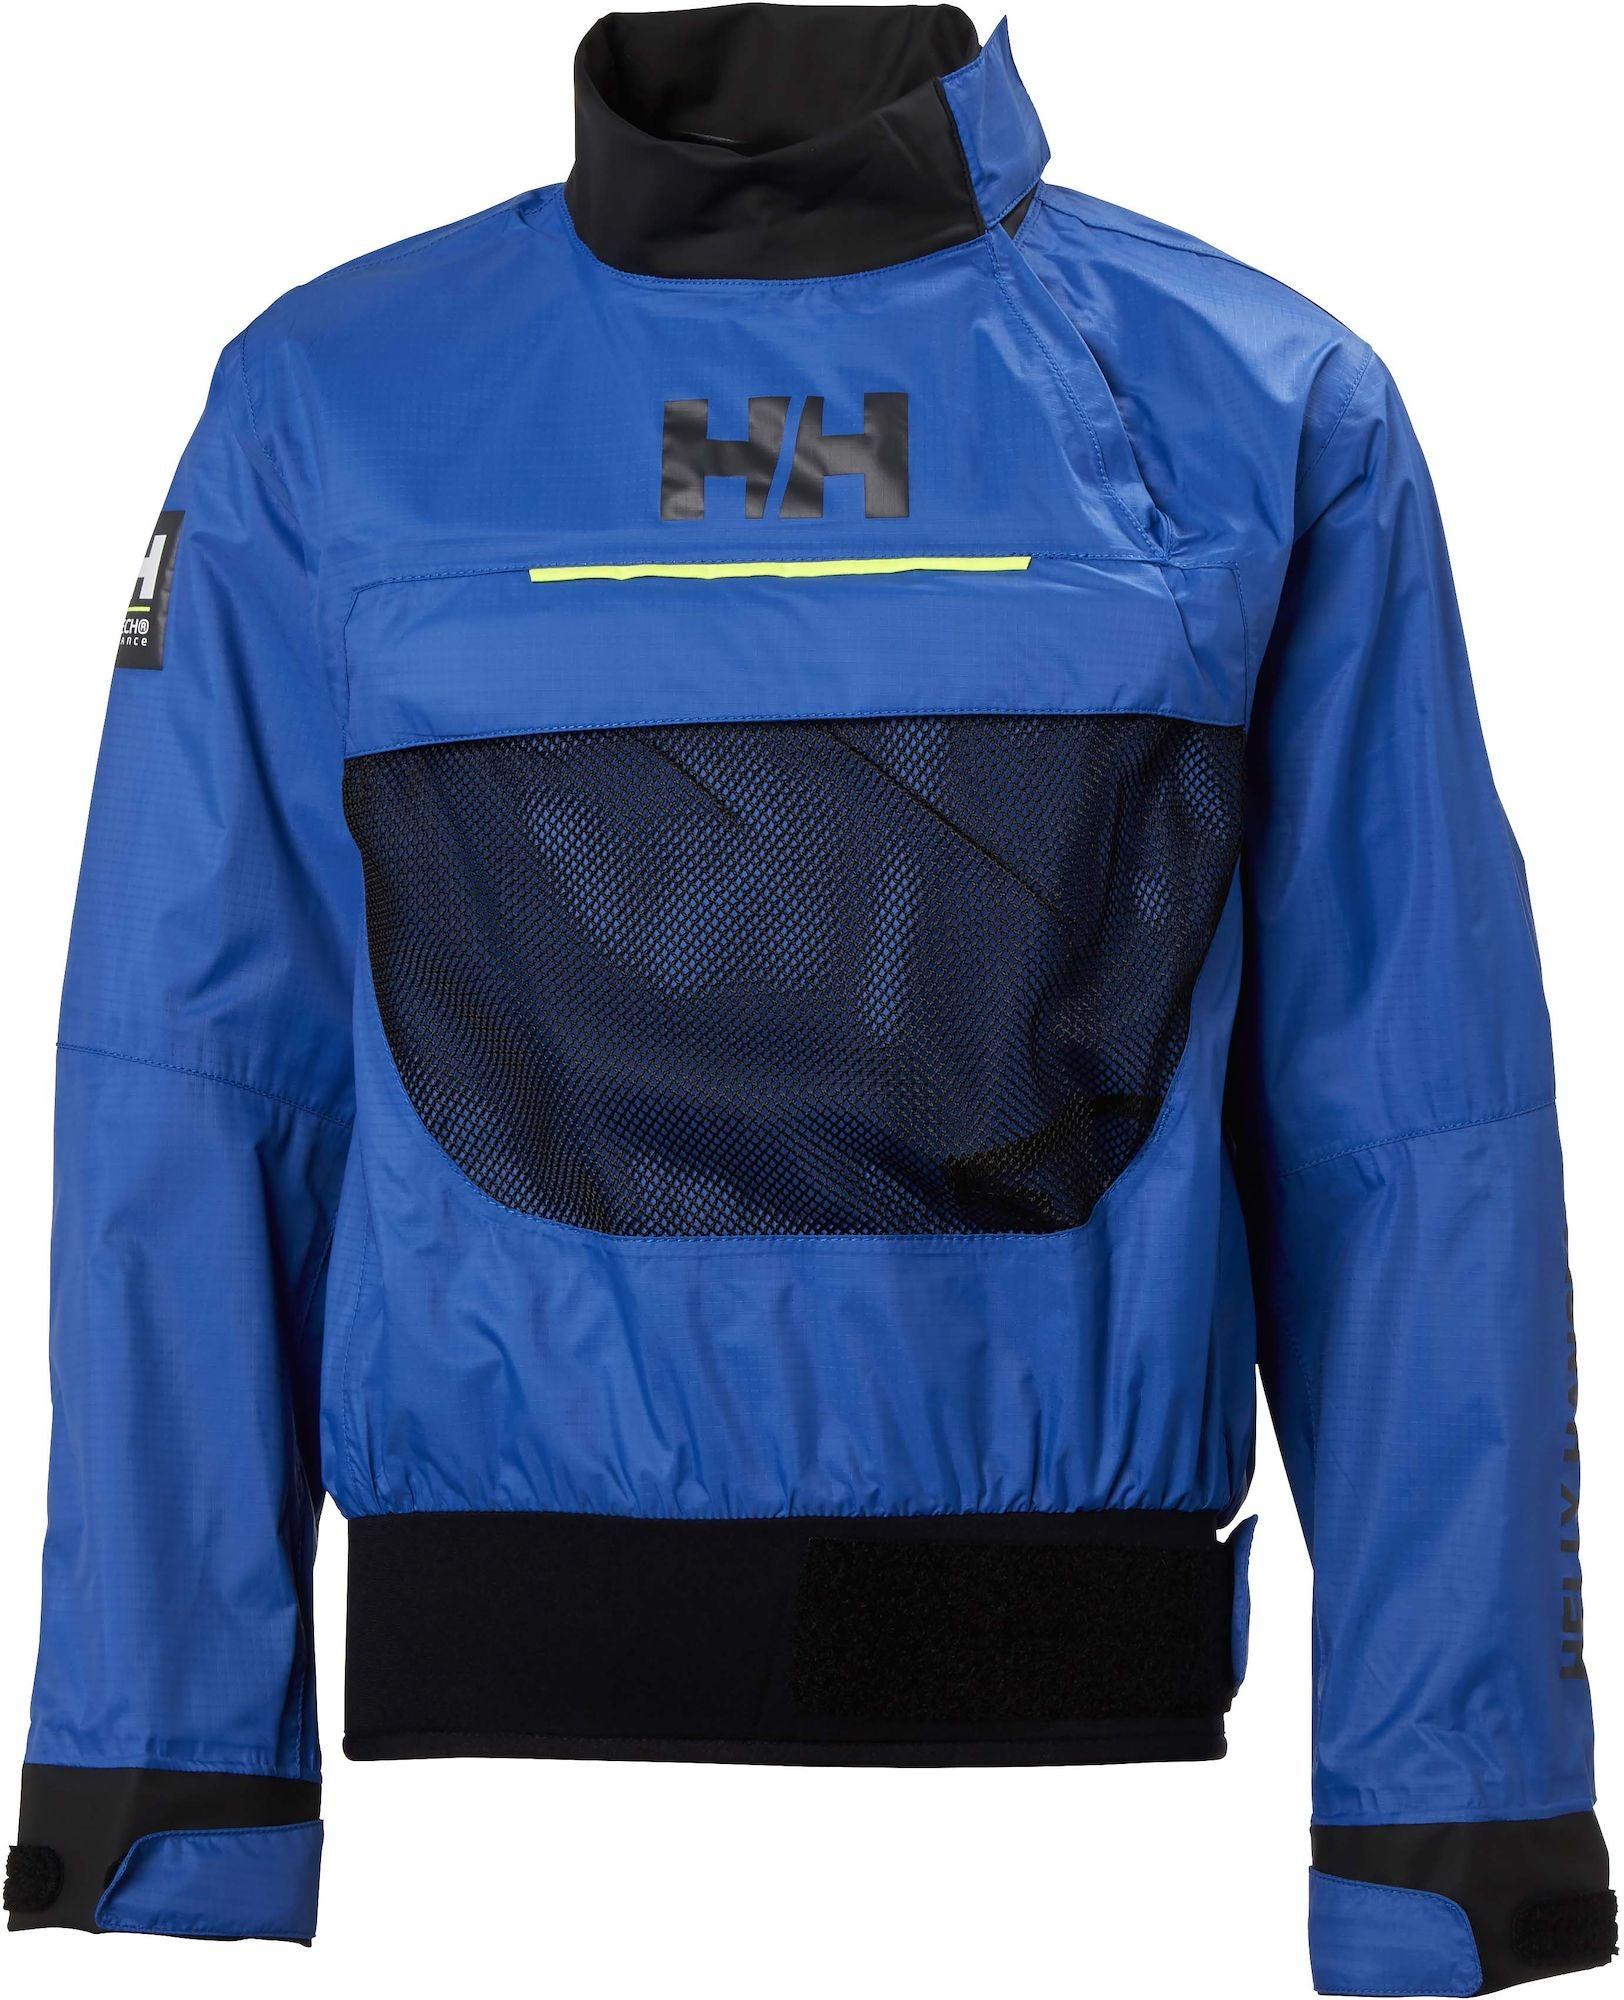 Helly Hansen HP Jacka, Olympian Blue, 128